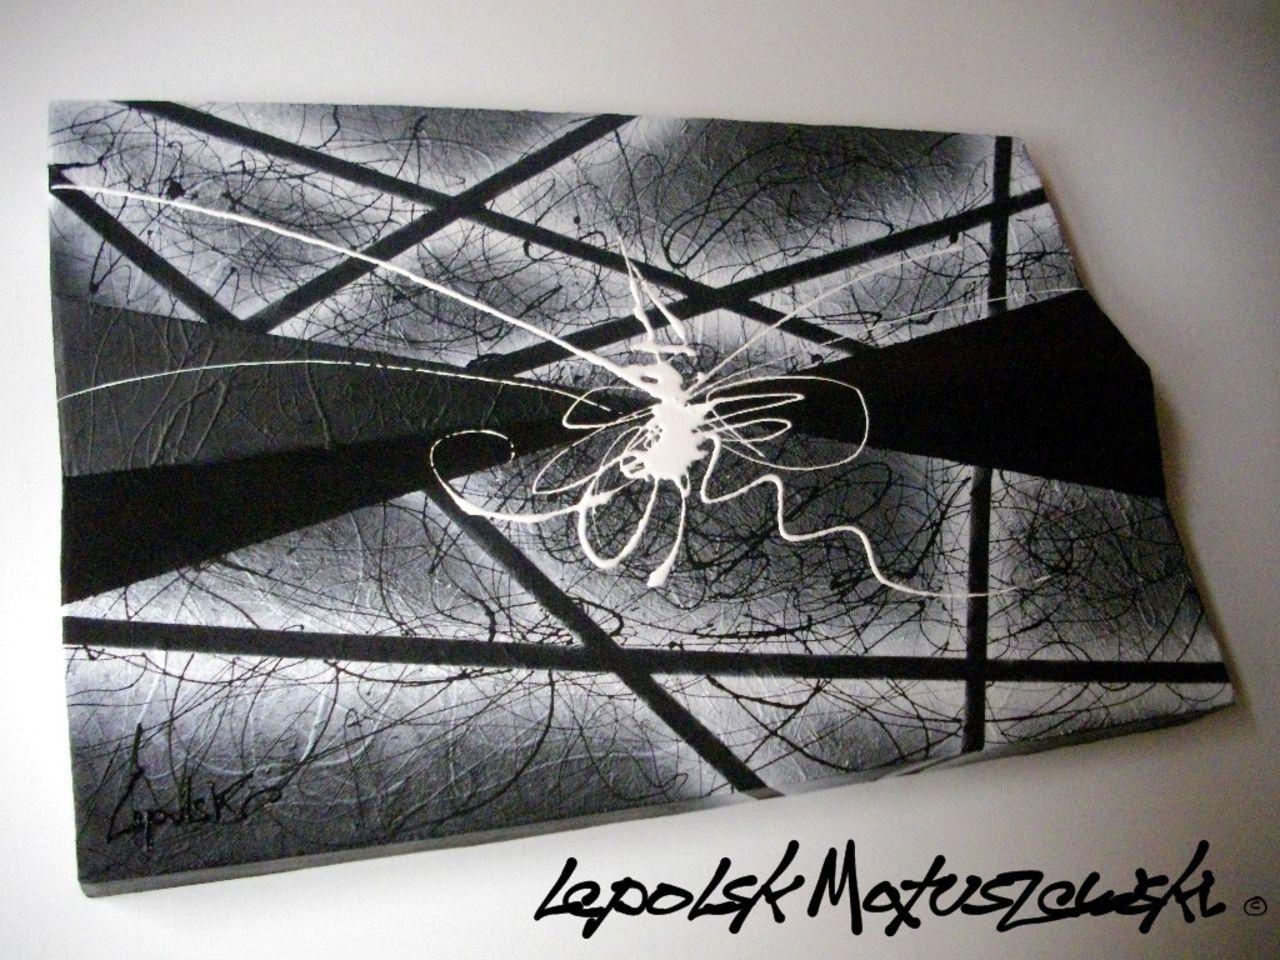 LEPOLSK MATUSZEWSKI Prototype 90 or Black Light  expressionnisme abstrait